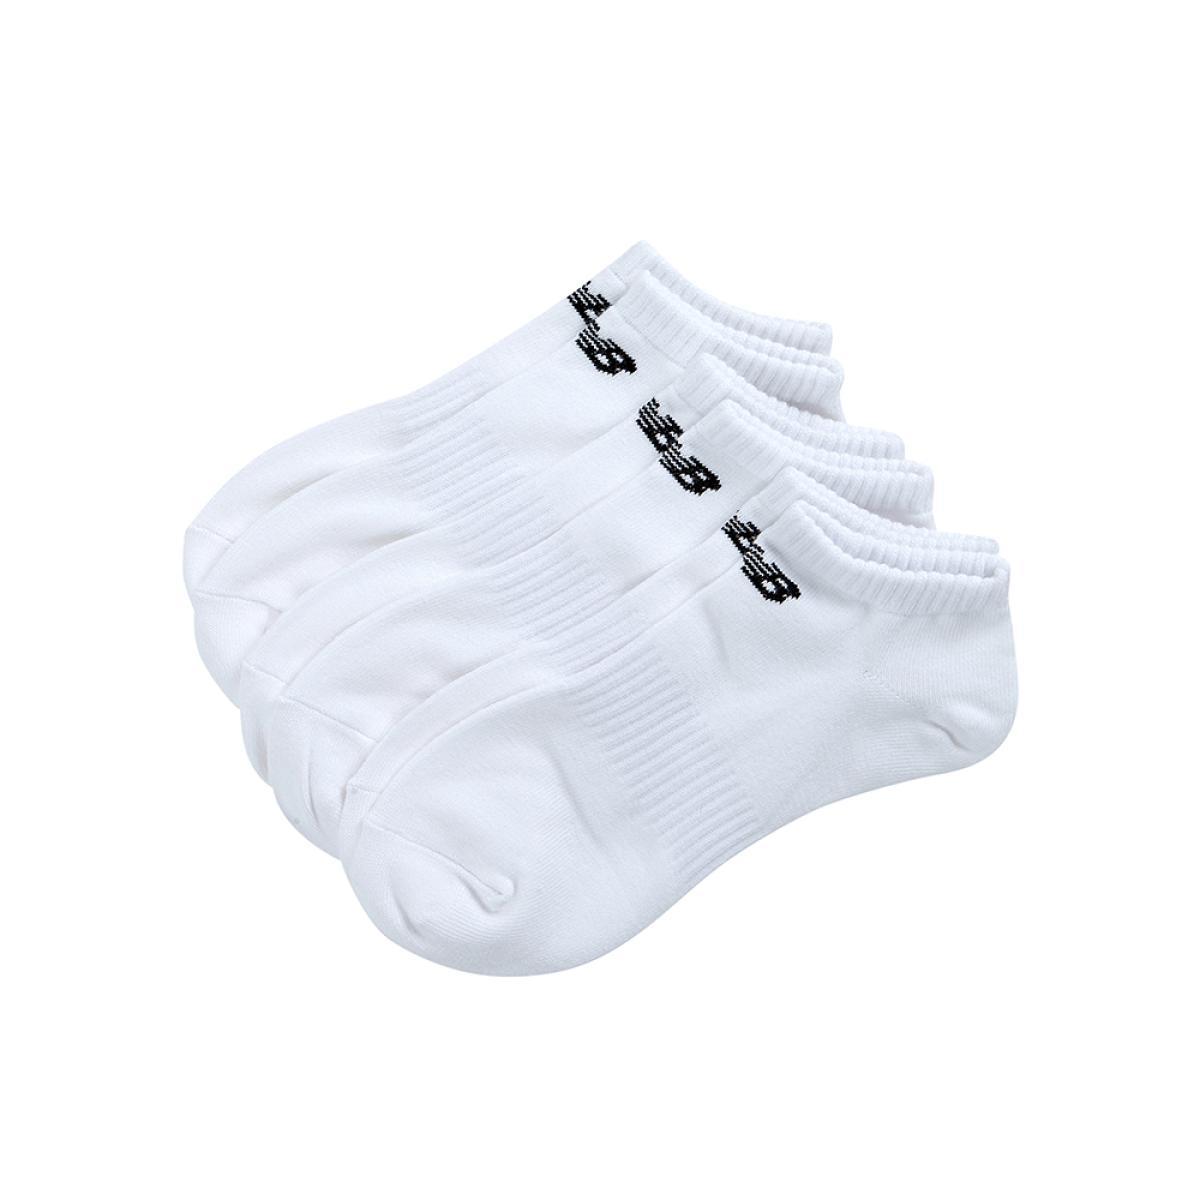 WOMEN 여성 발목양말 3PACK